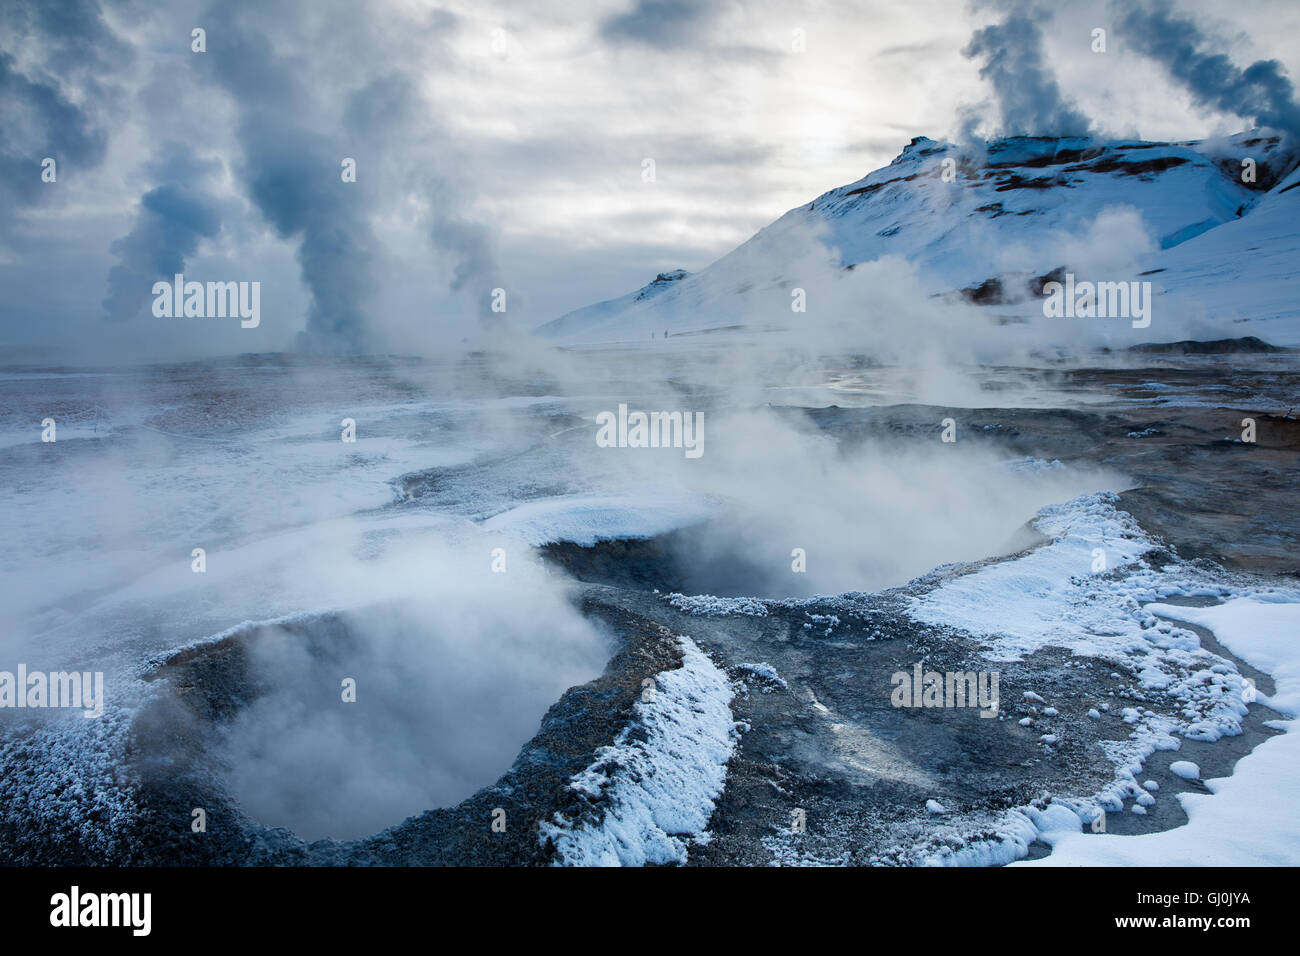 Geysers at, près de Mývatn, nord-est de l'Islande Photo Stock